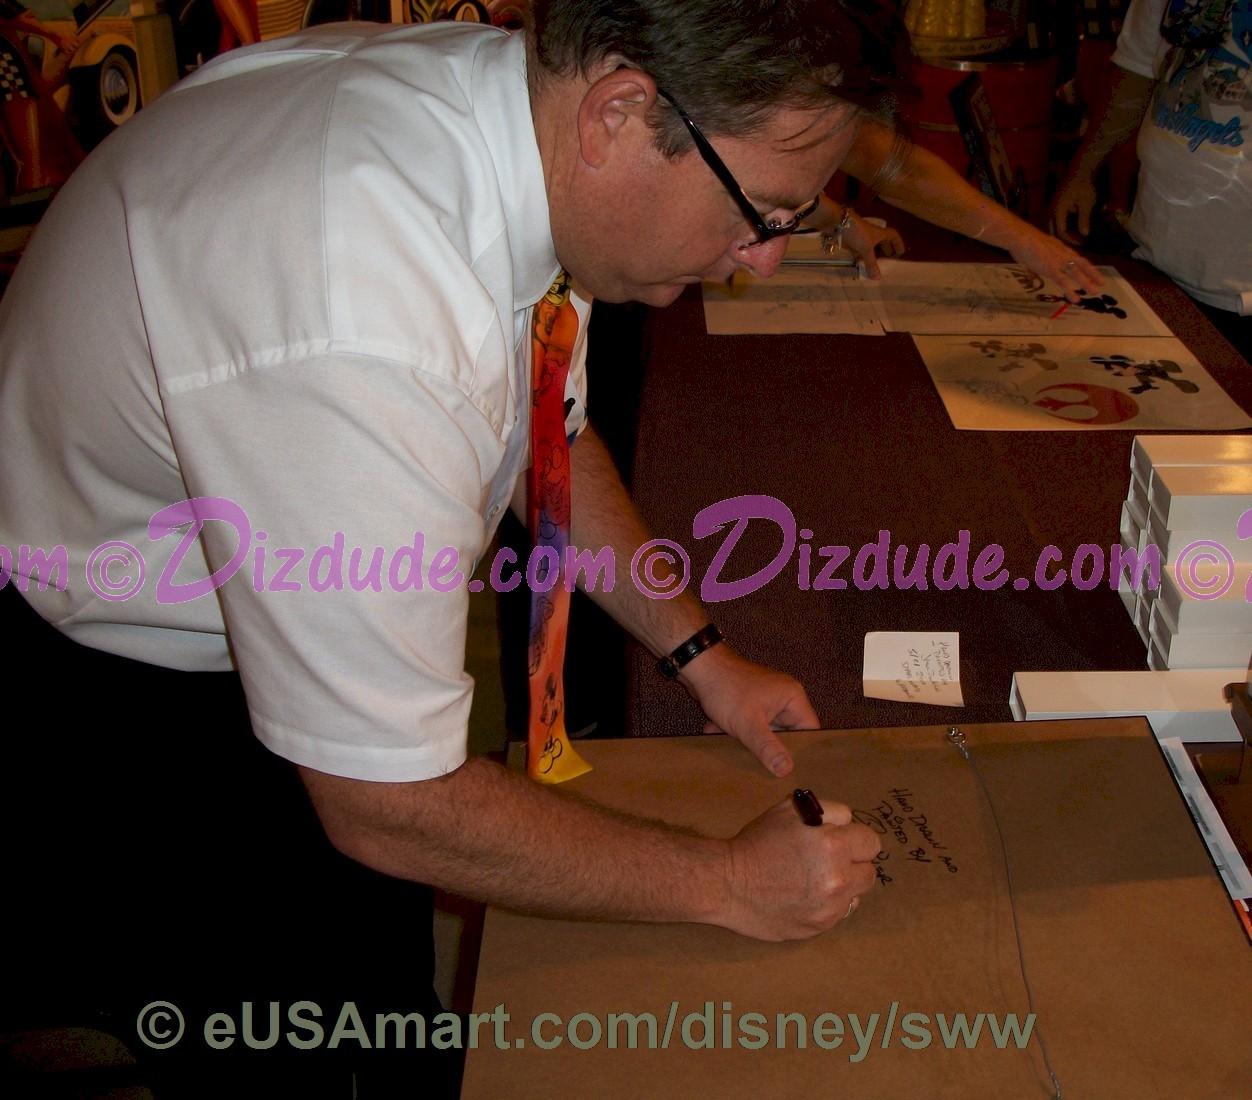 Dizdude Com 5 Star Wars Bounty Hunter Actors Signed Disney Lucas